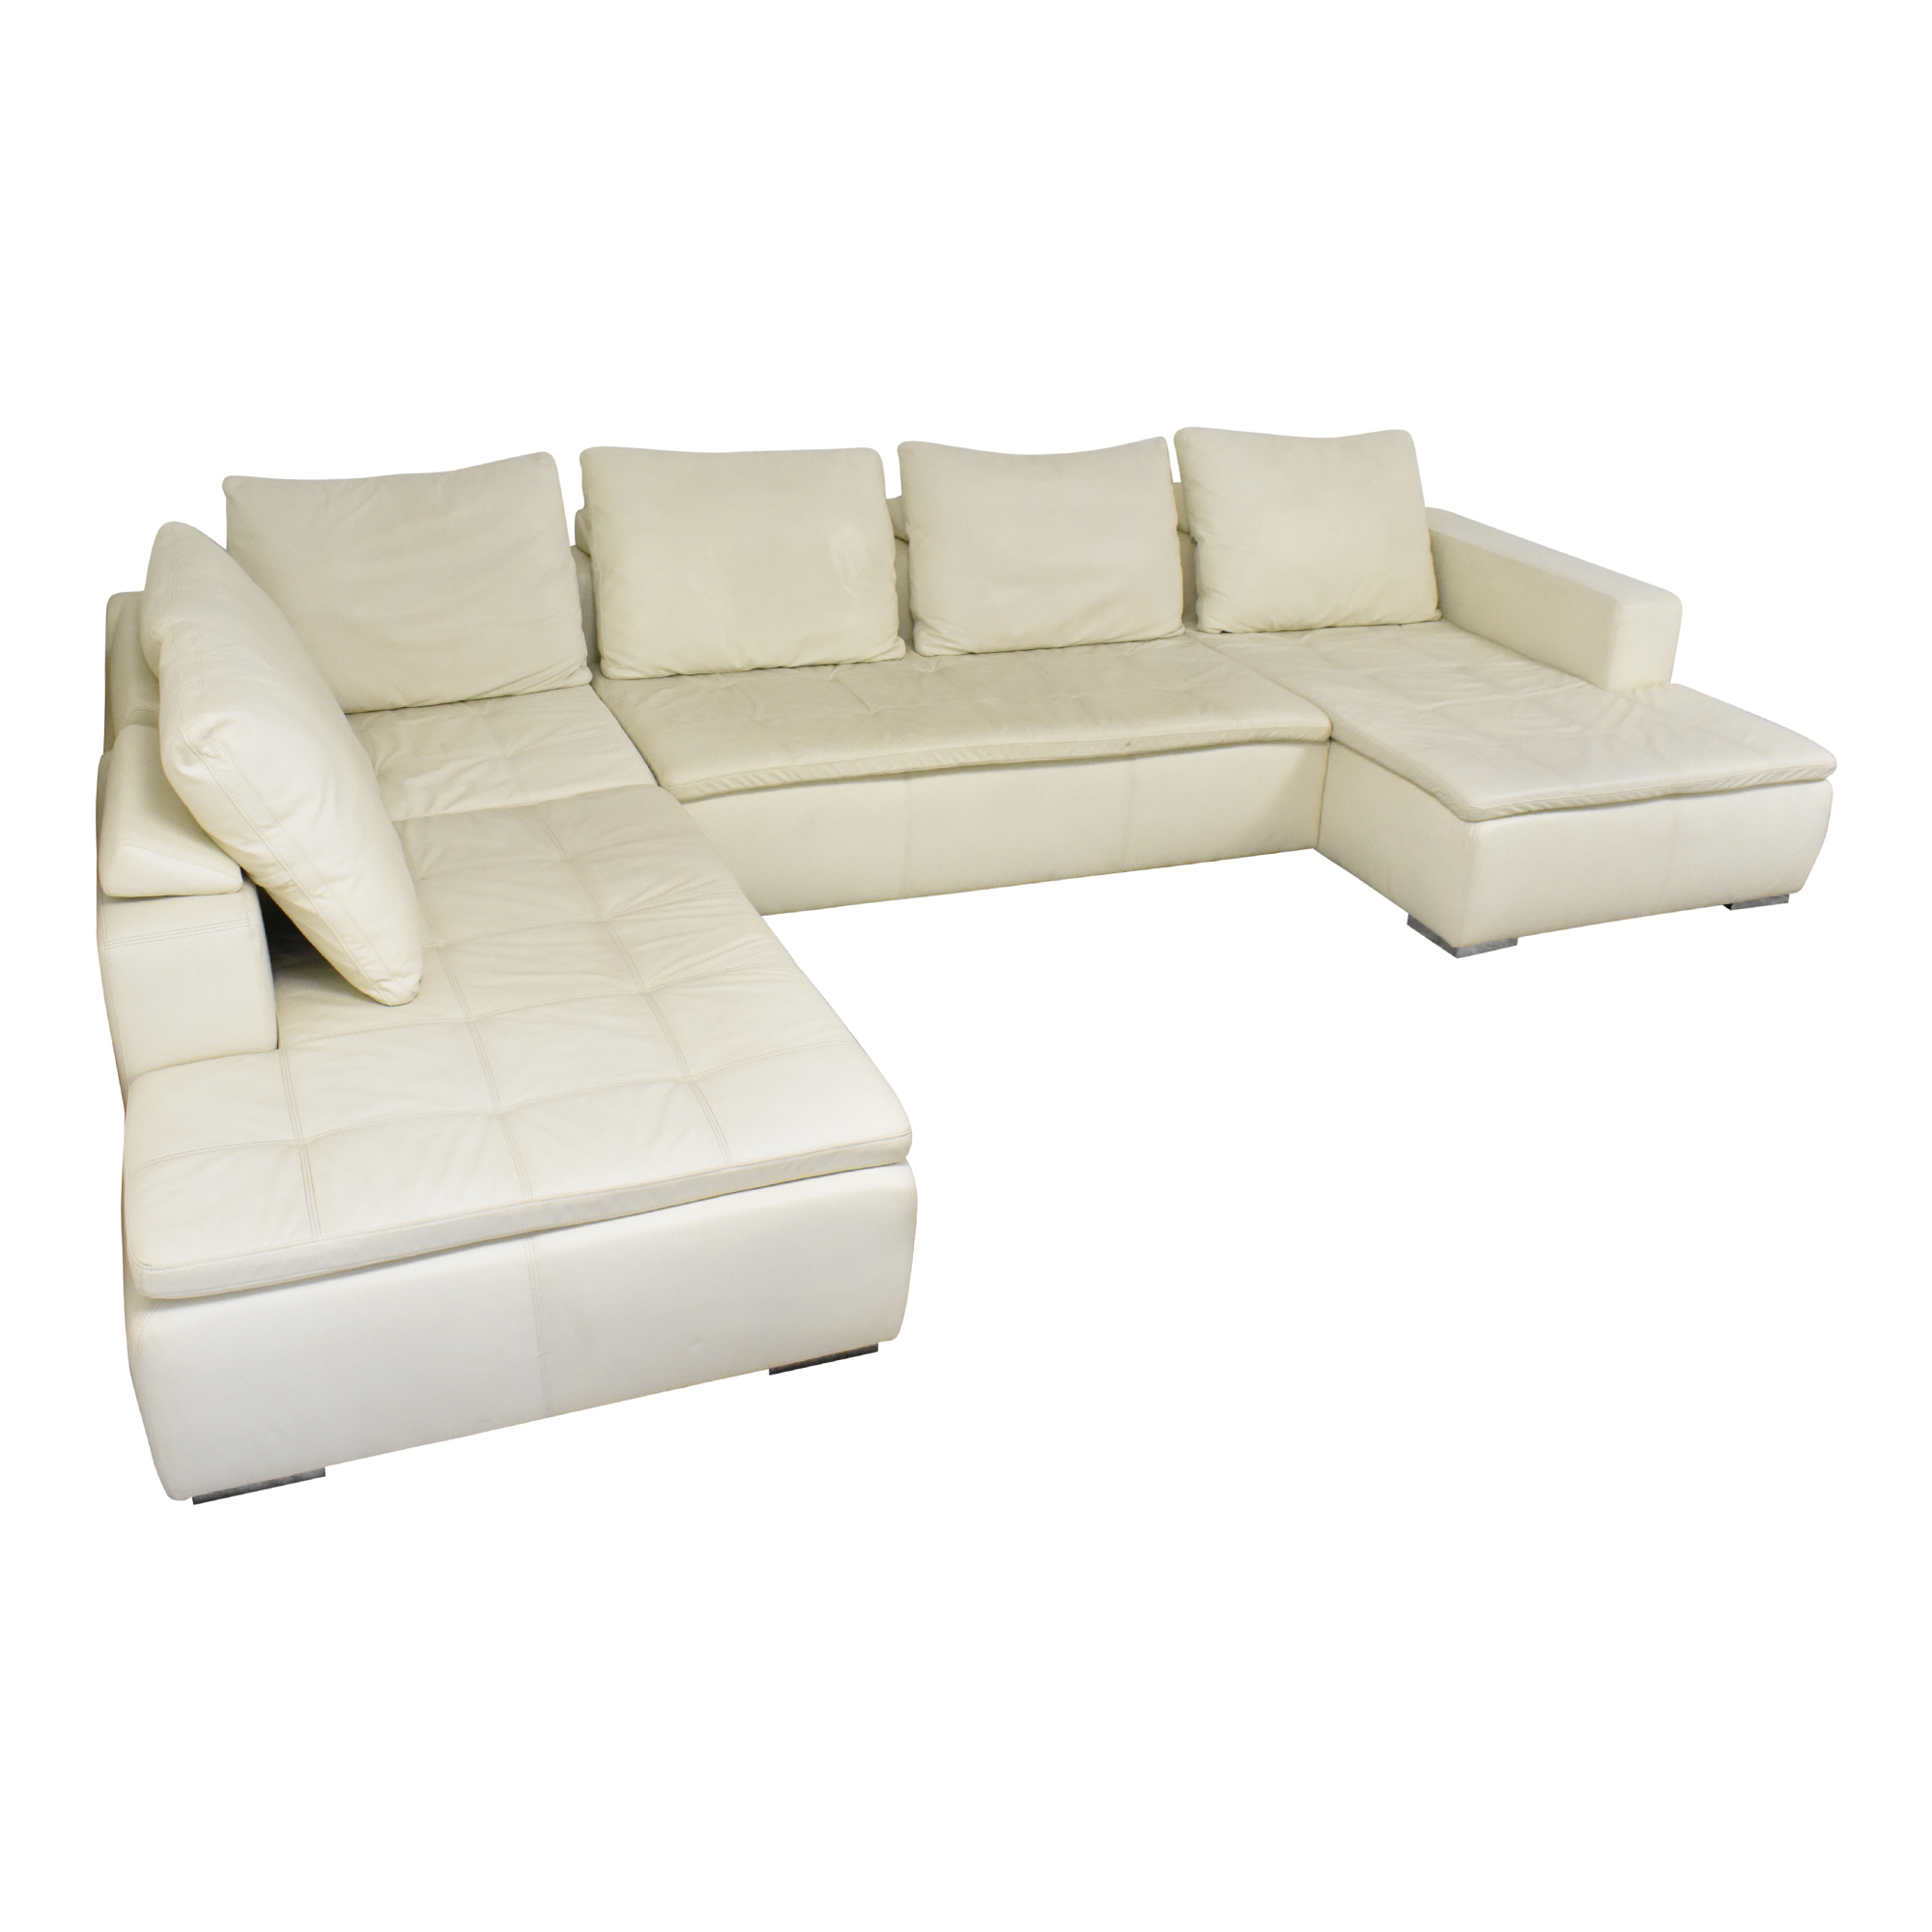 BoConcept Mezzo Sectional Sofa / Sofas